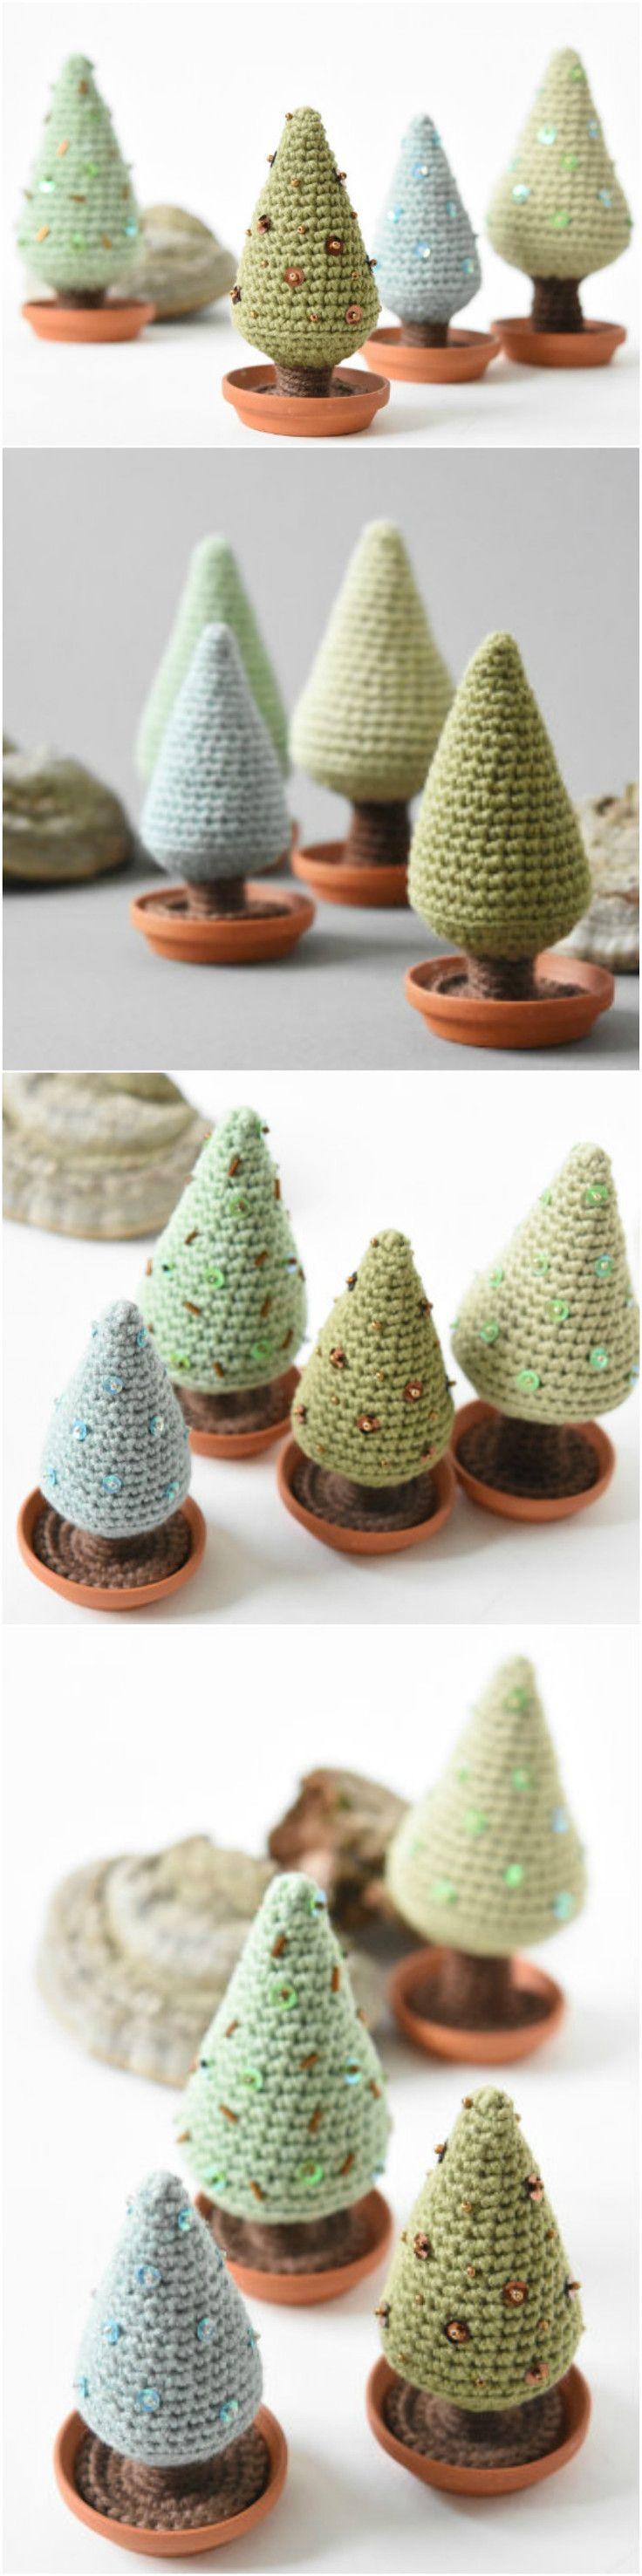 FREE Christmas Tree amigurumi crochet pattern by Lilleliis